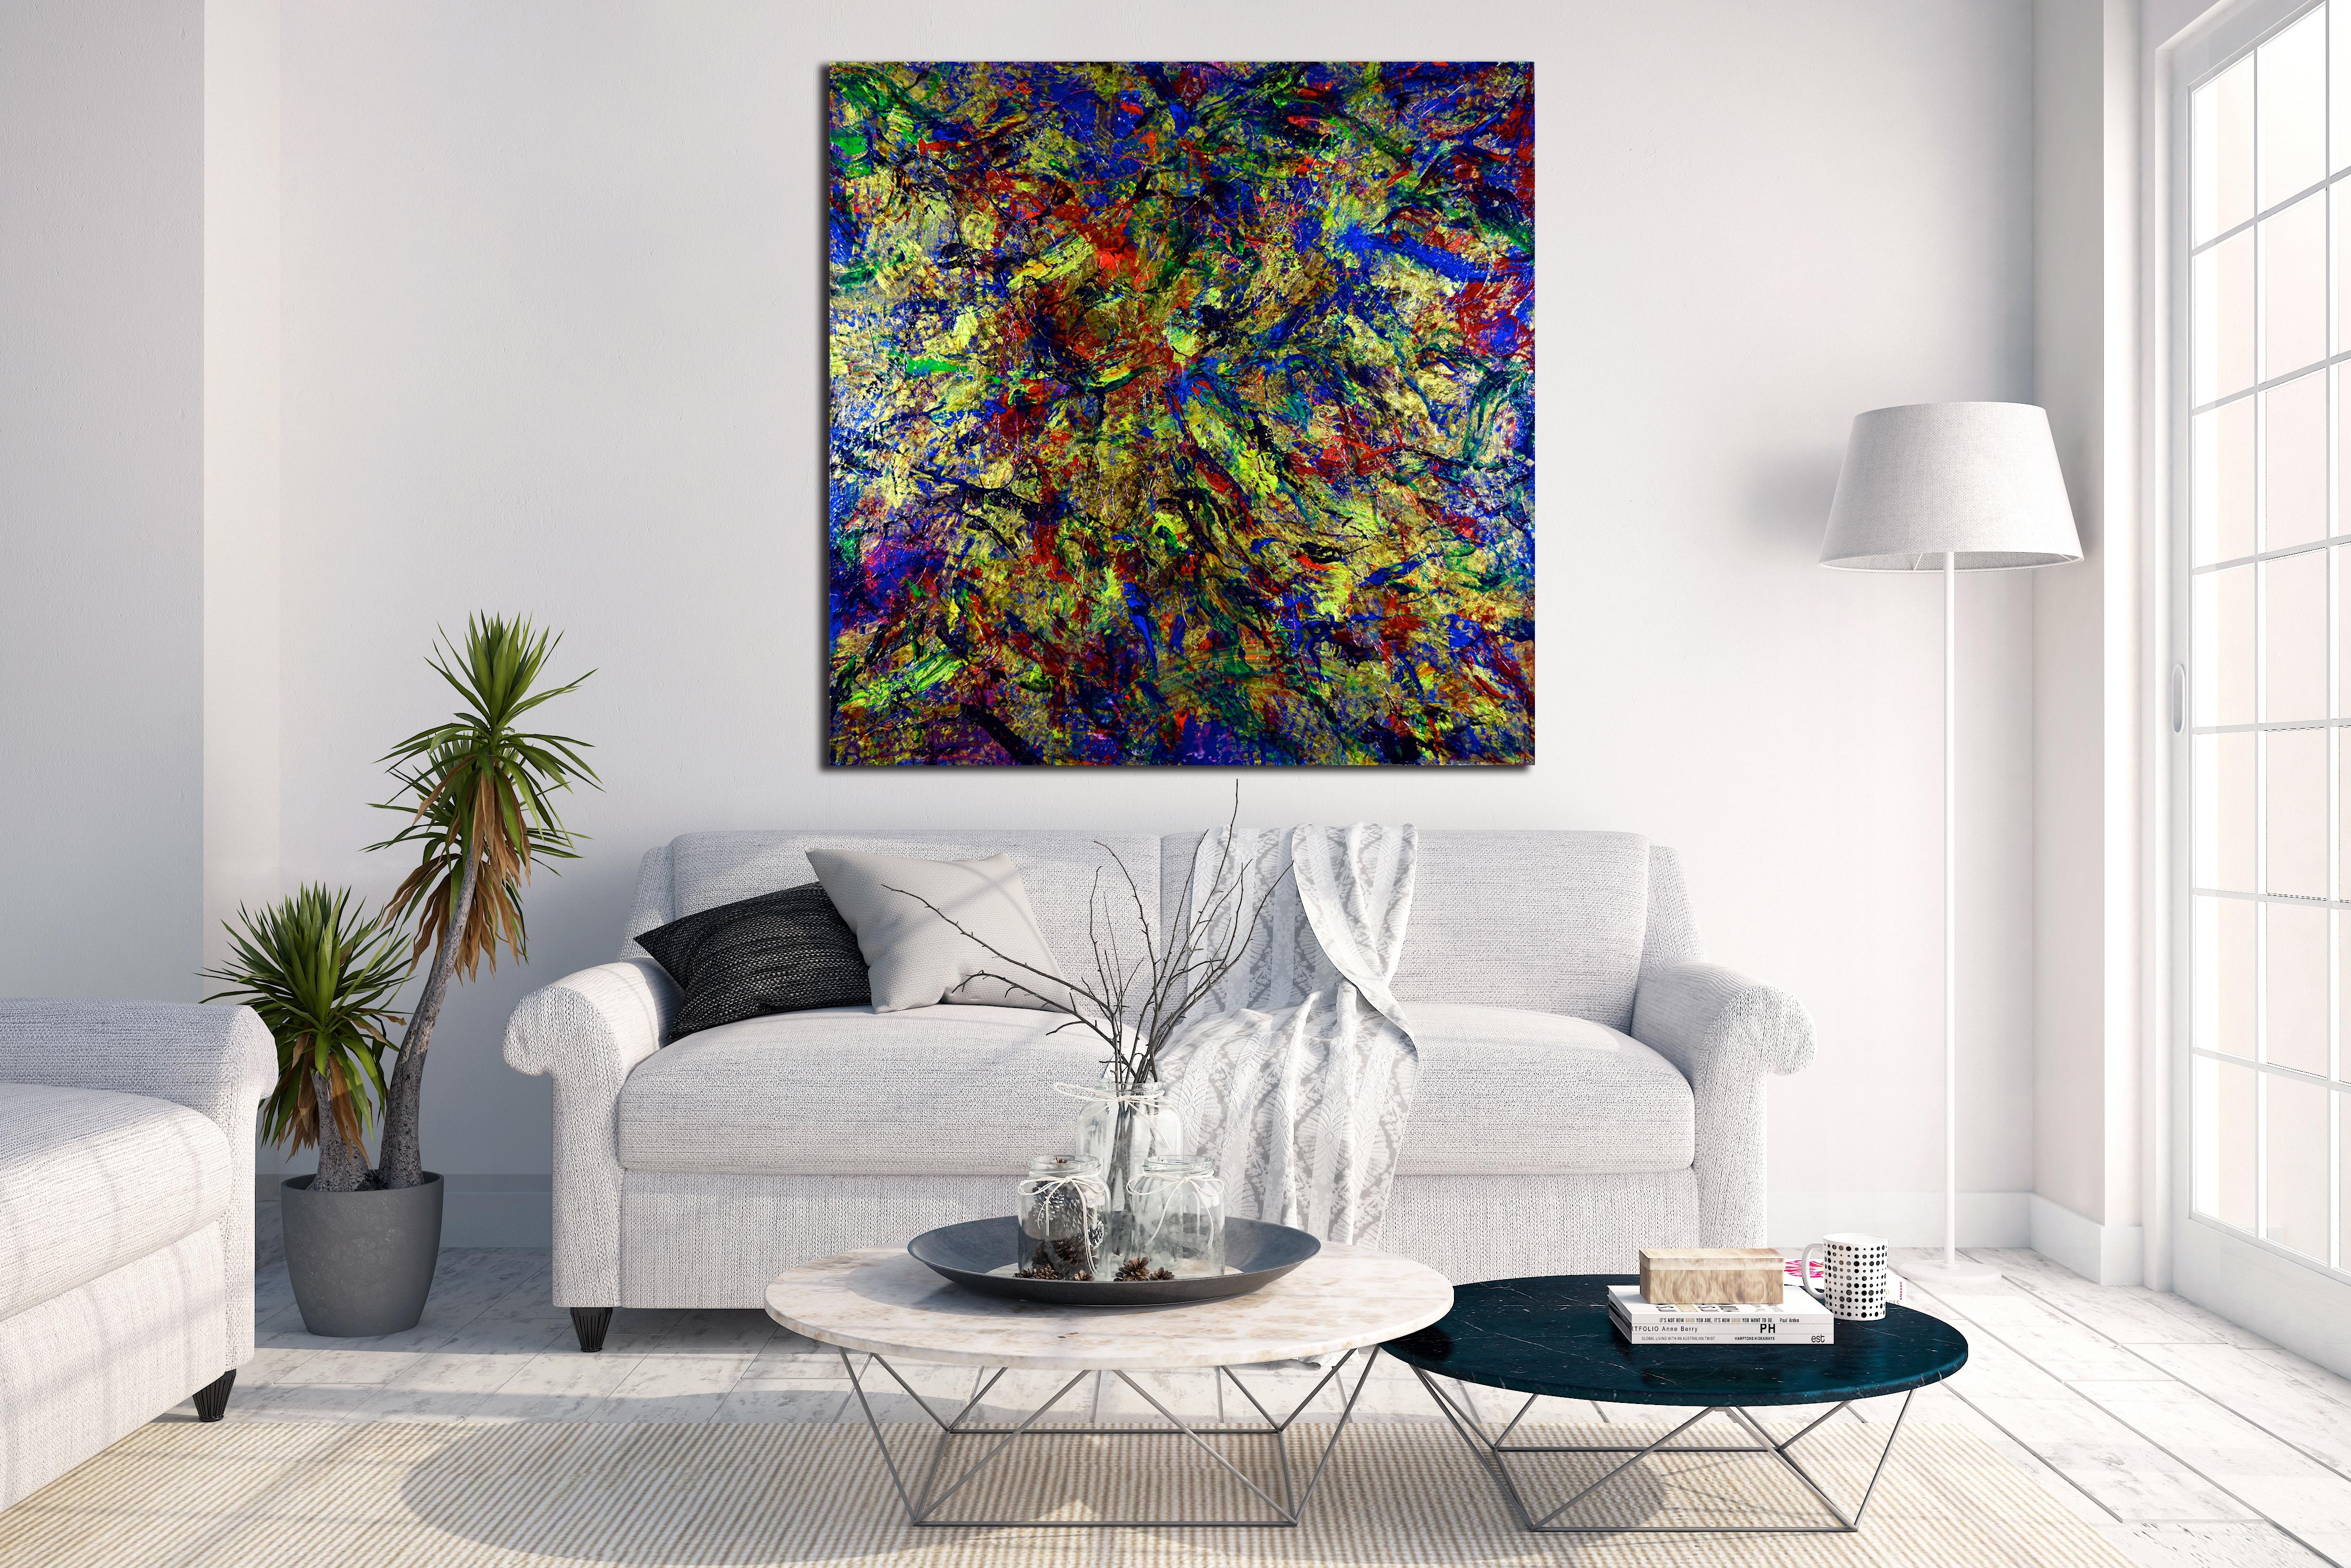 Nestor Toro abstract artist working in Los Angeles